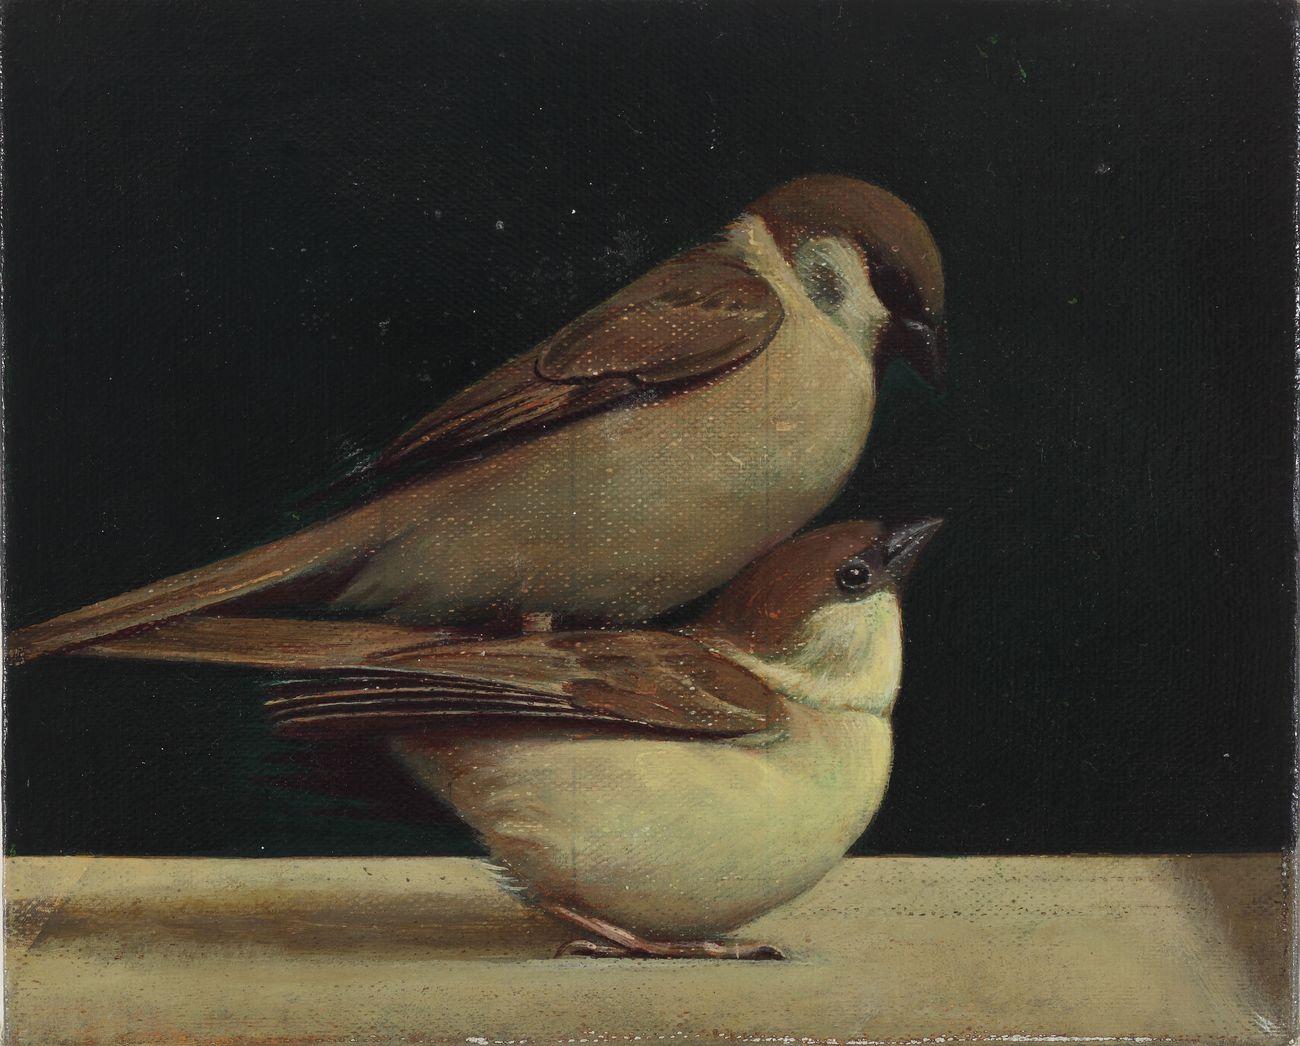 Liu Ye, Bird on Bird , 2011, acrilico su tela, 22 x 28 cm. Wang Bing Collection, Beijing. Courtesy Fondazione Prada